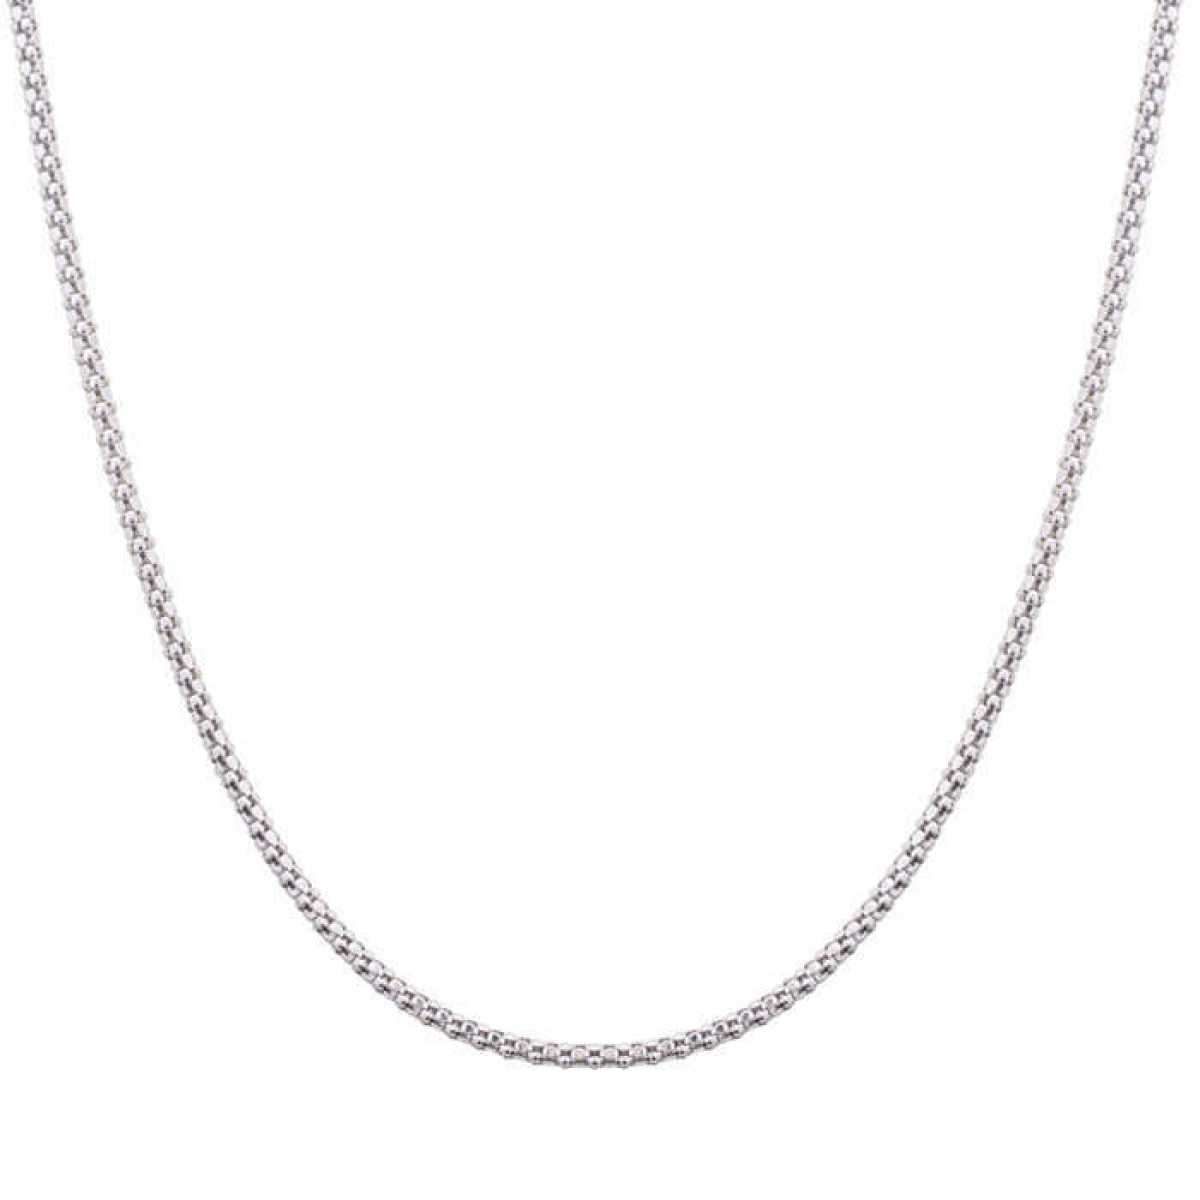 Simple Silver Chain